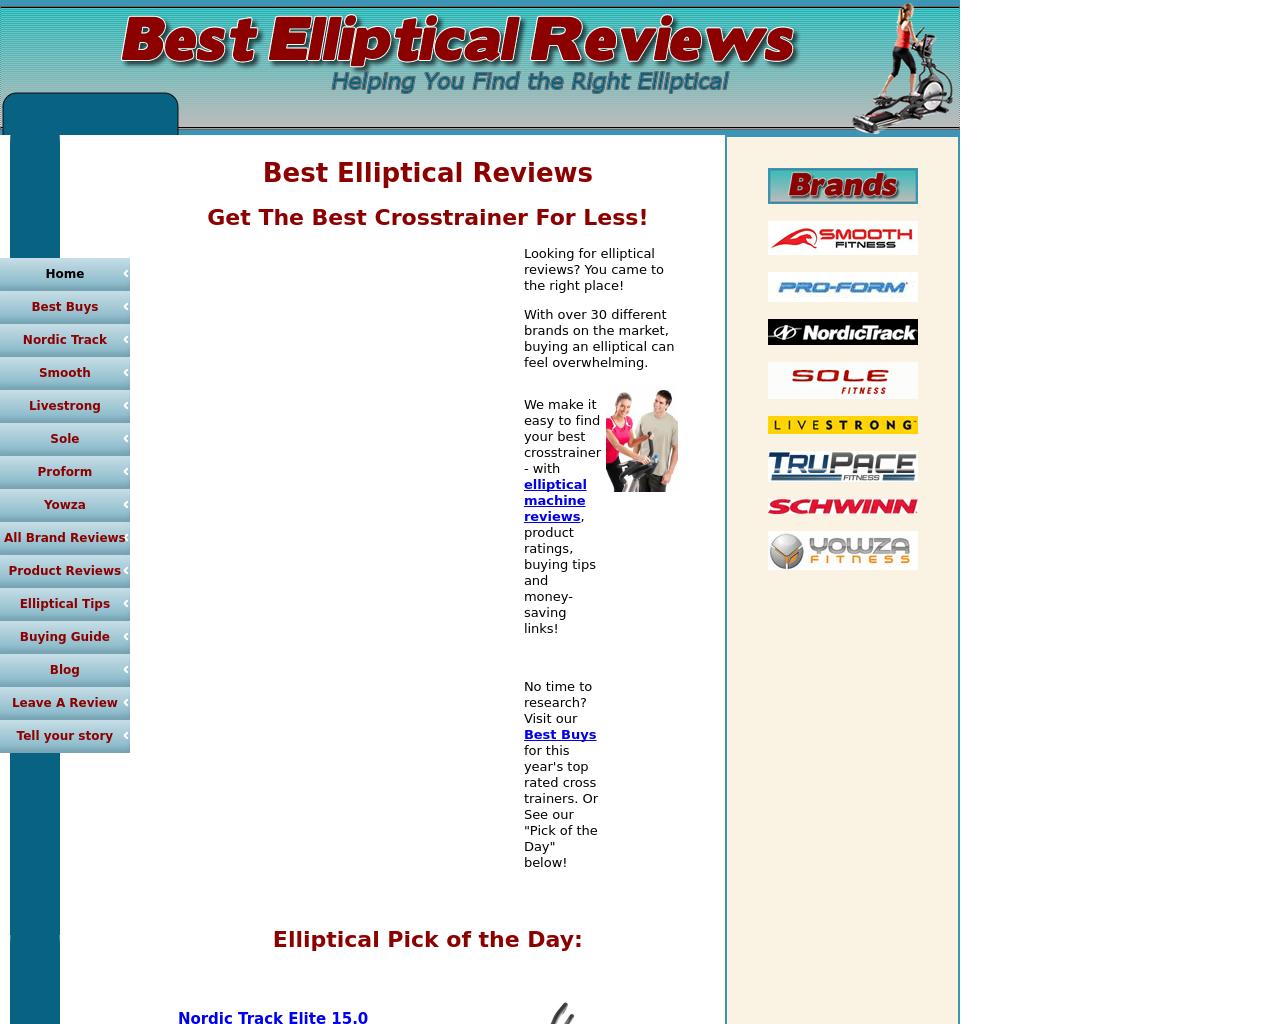 Best-Elliptical-Reviews-Advertising-Reviews-Pricing